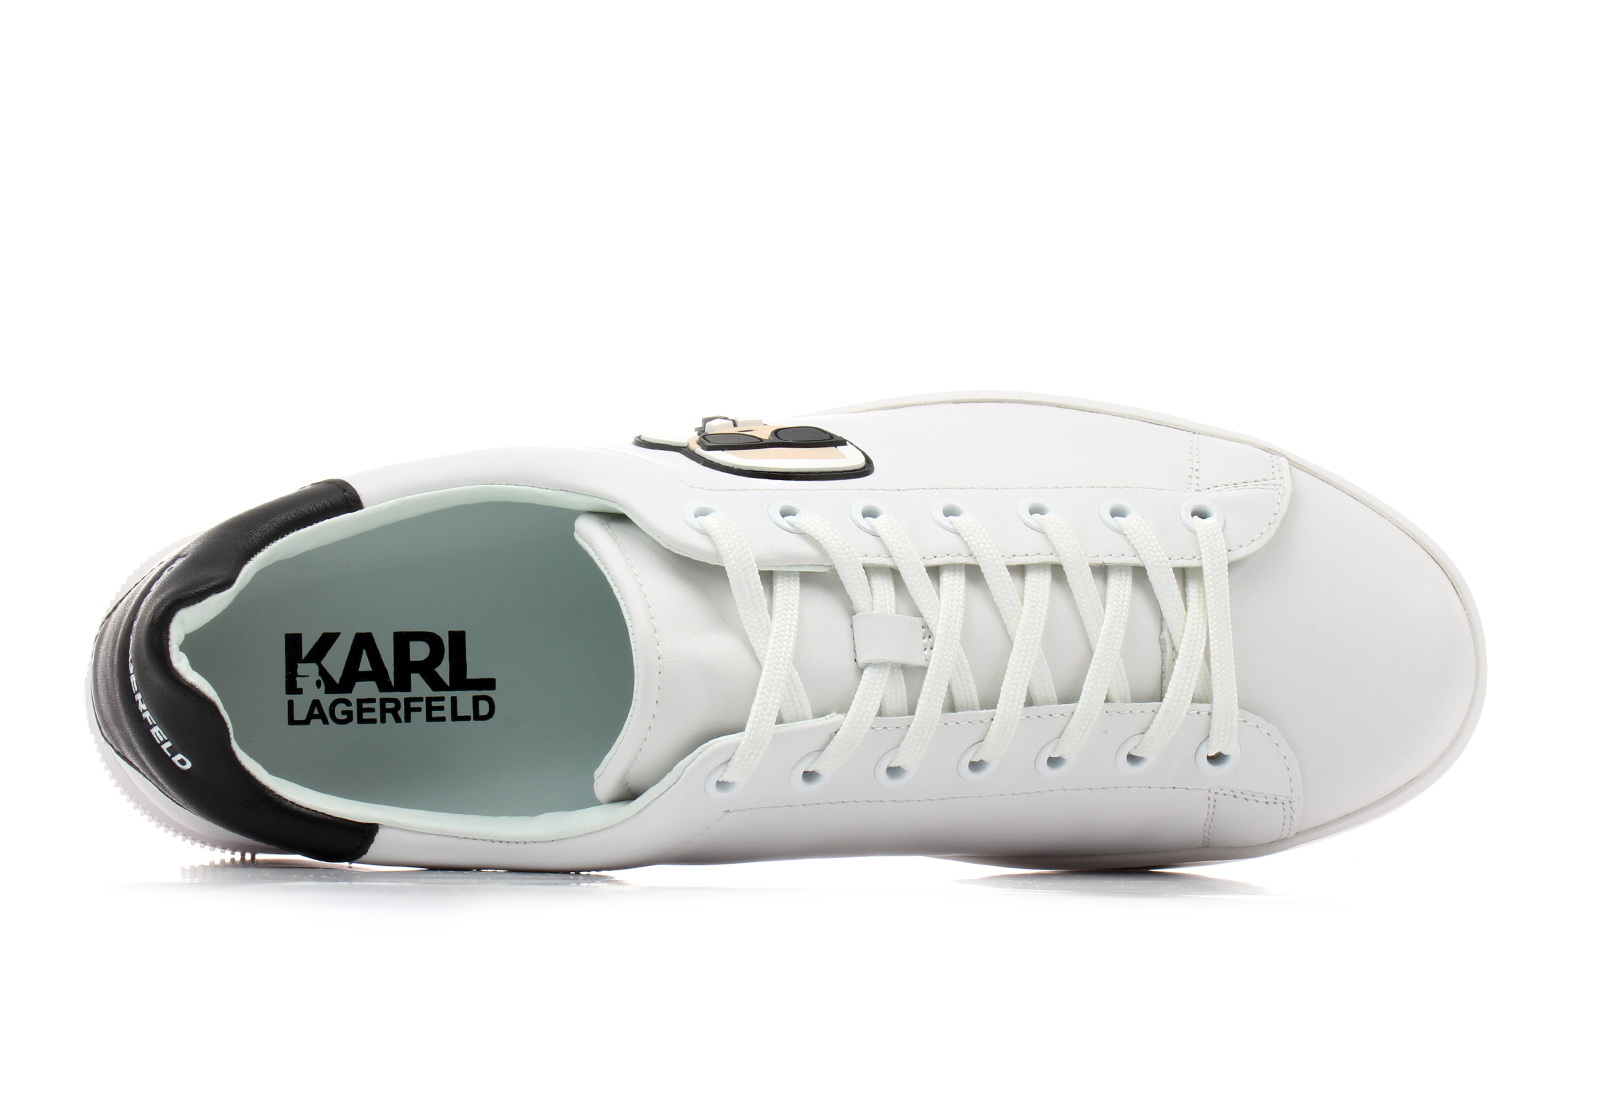 729a2d9a26 Karl Lagerfeld Cipő - Kourt Karl Ikonik - KL51210-011 - Office Shoes ...